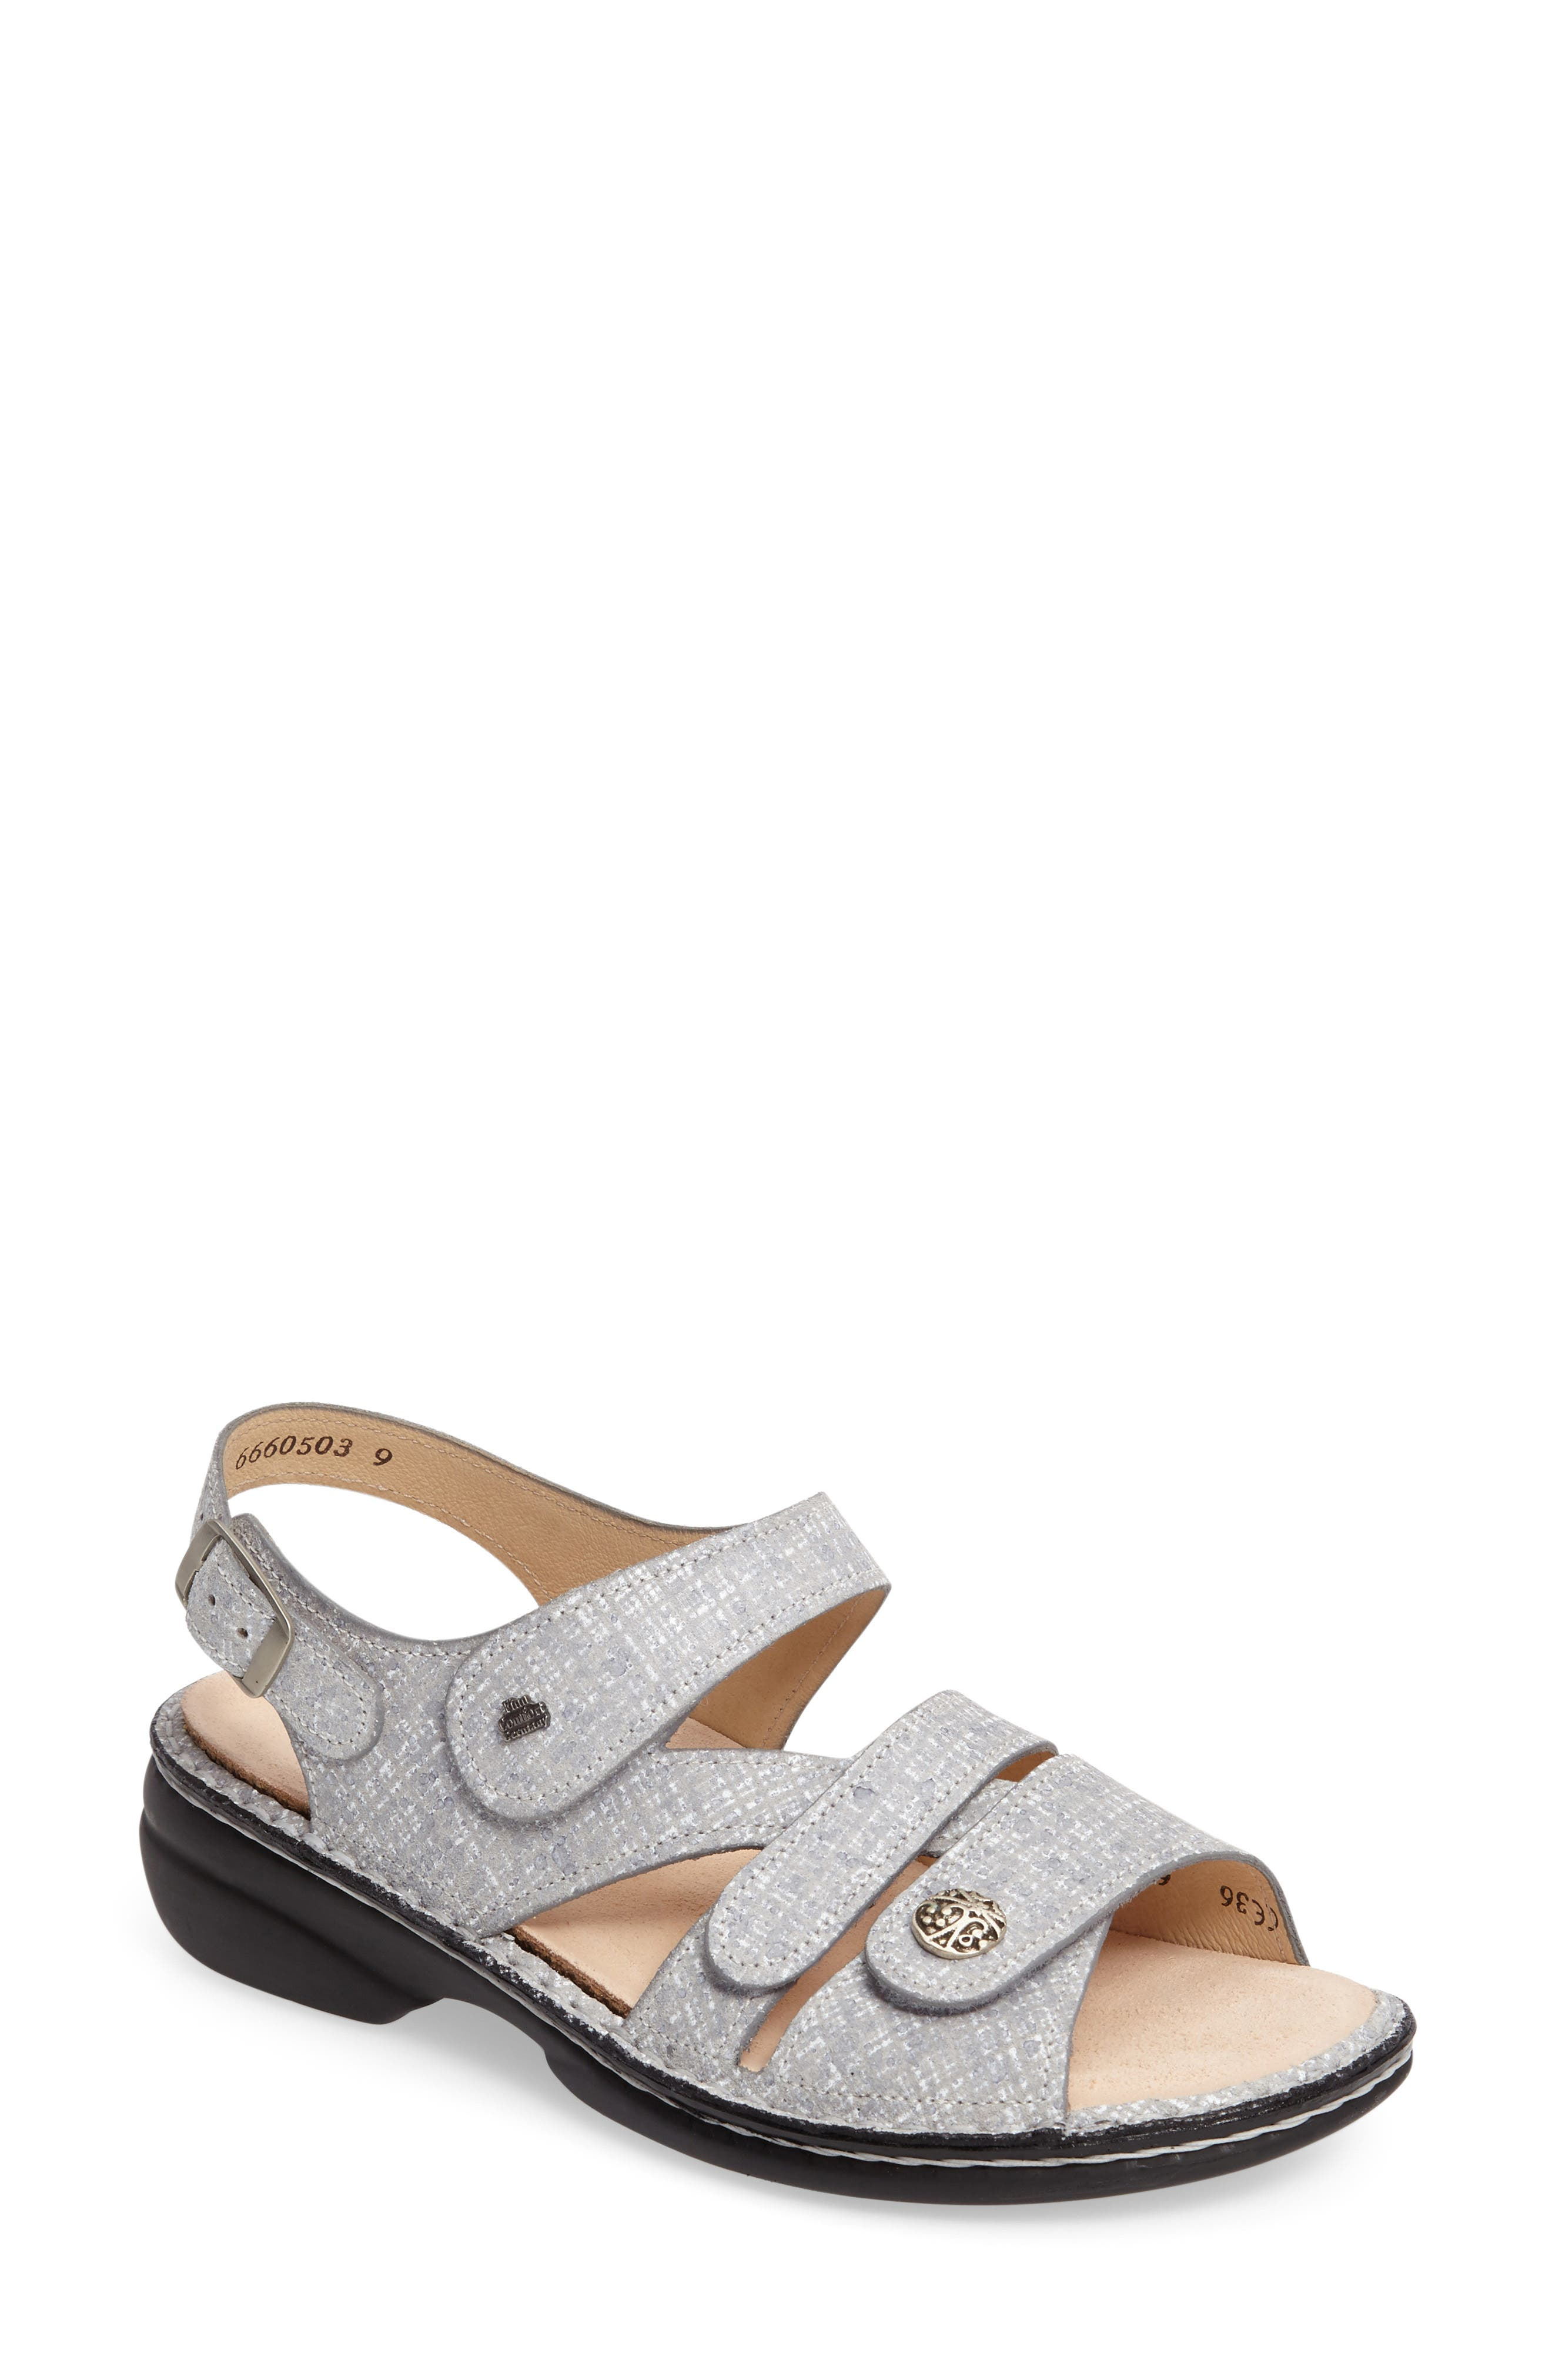 Main Image - Finn Comfort 'Gomera' Sandal